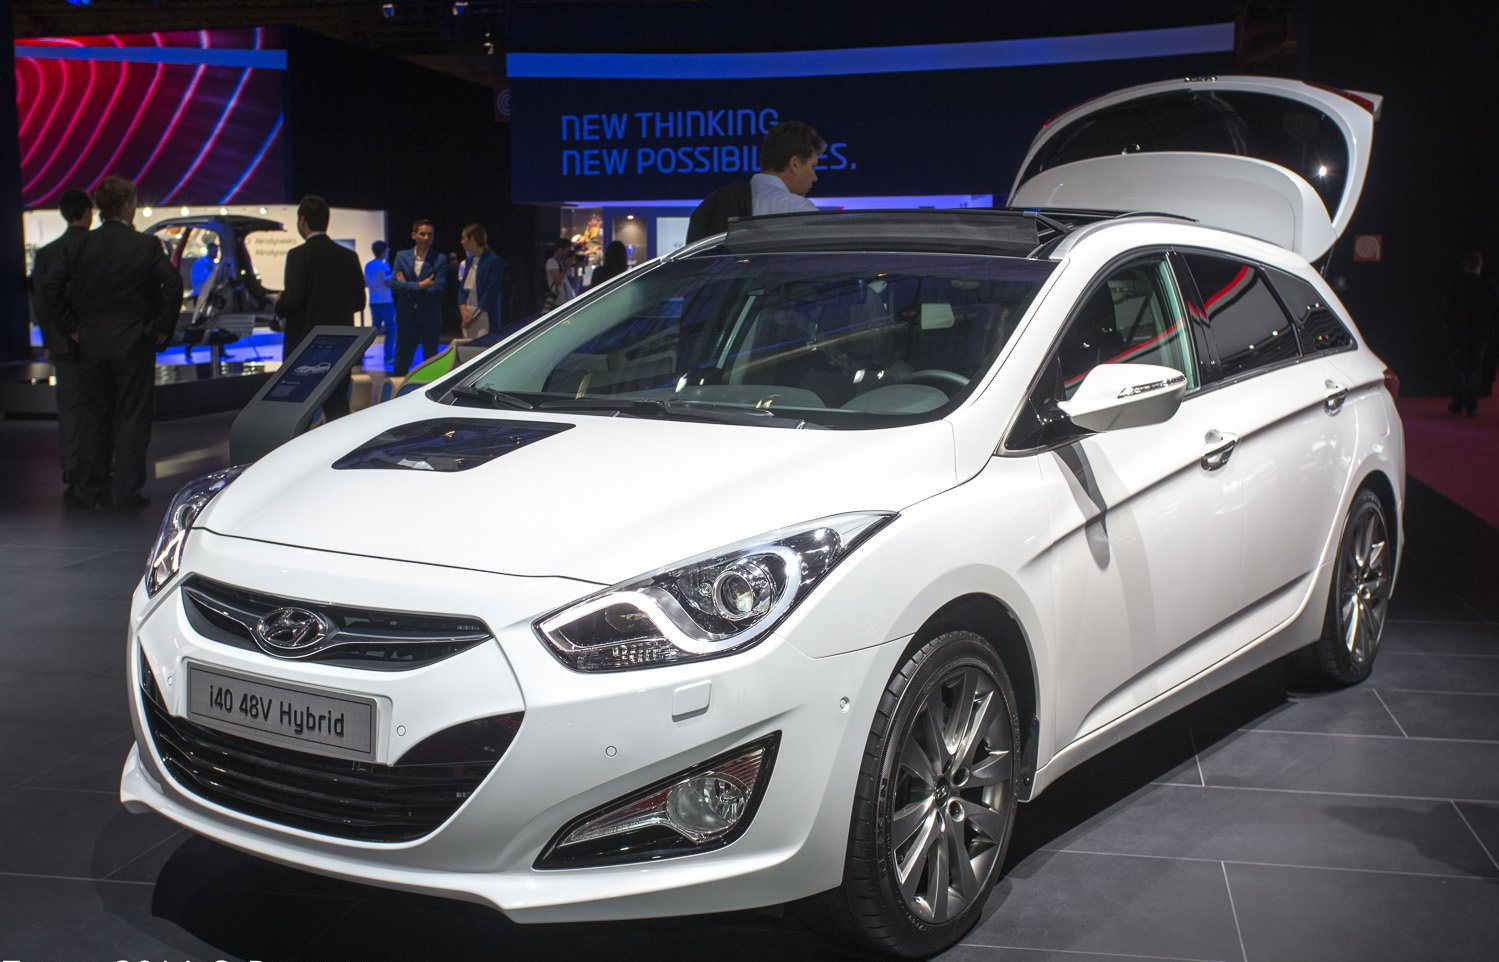 hyundai hybrid cars at paris motor show 2014. Black Bedroom Furniture Sets. Home Design Ideas